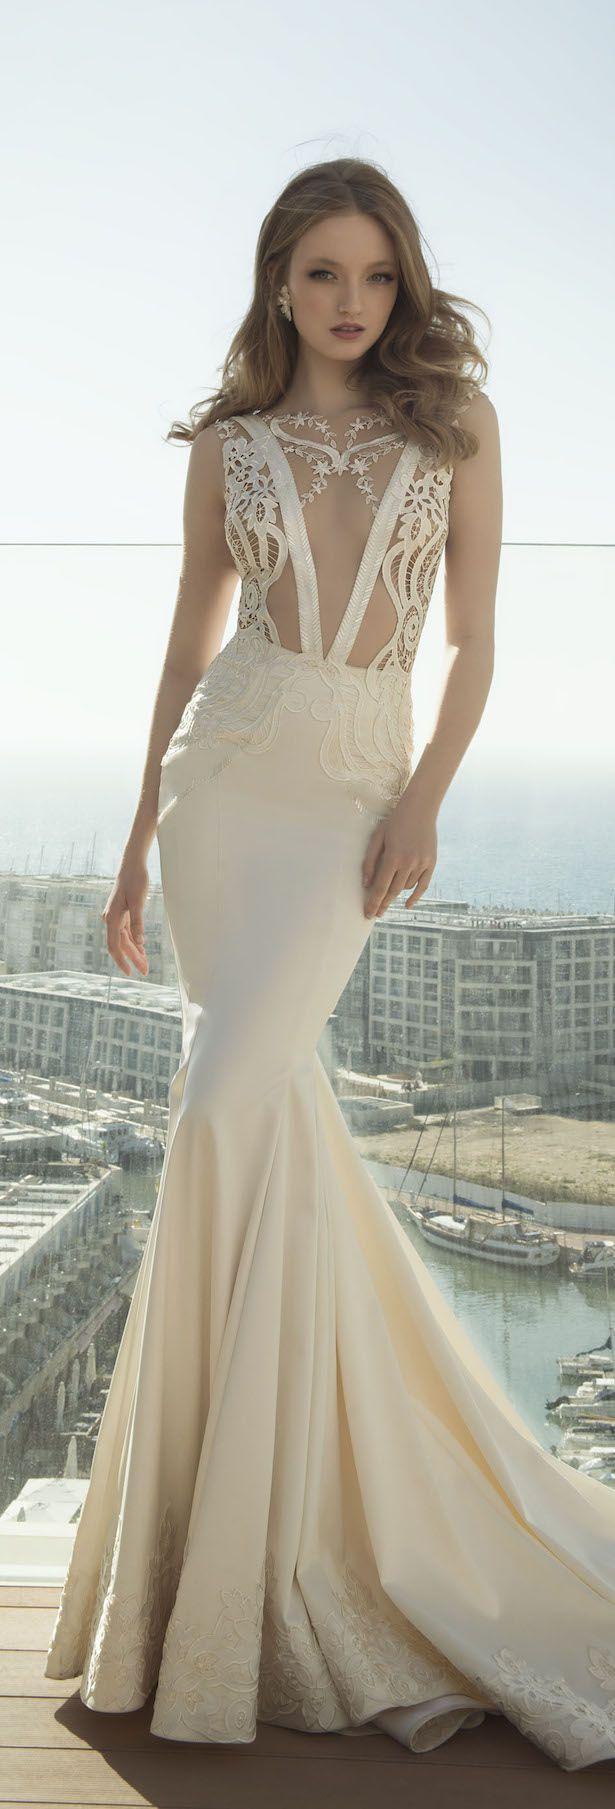 Wedding - Dany Mizrachi 2016 Wedding Dress - Belle The Magazine